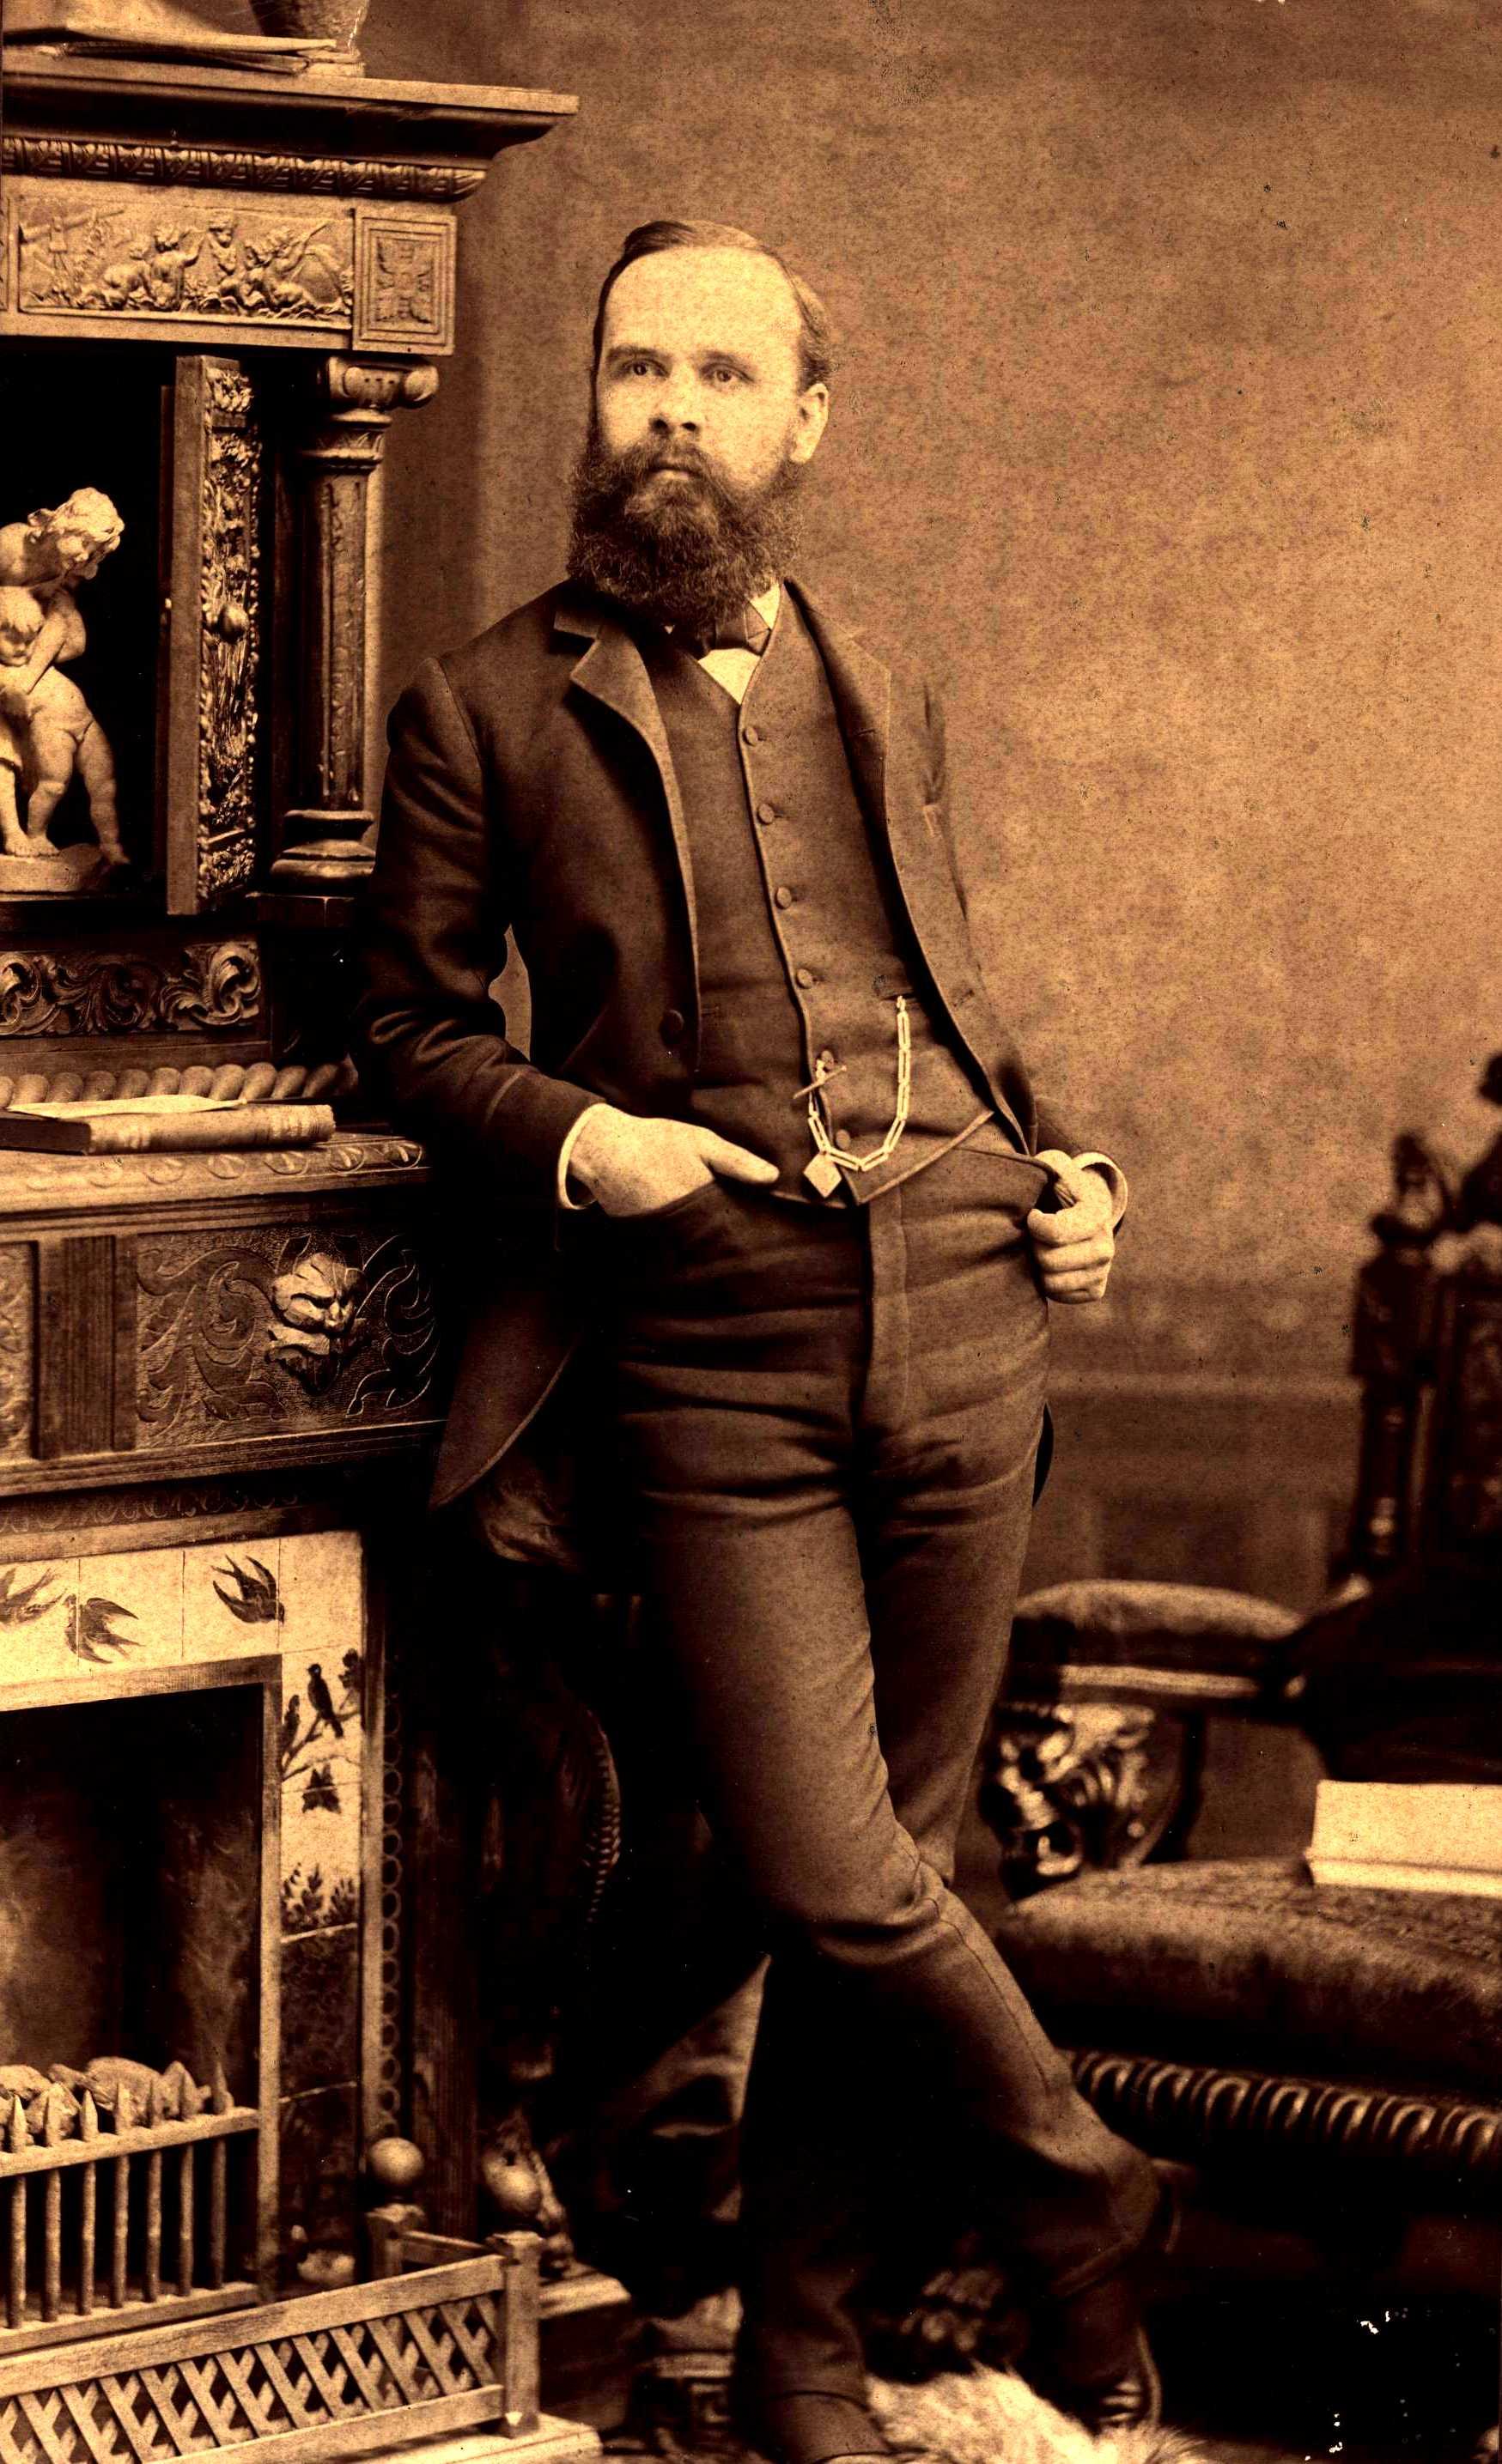 Benjamin Tucker fotografiat per Hardy (Boston, ca. 1887)